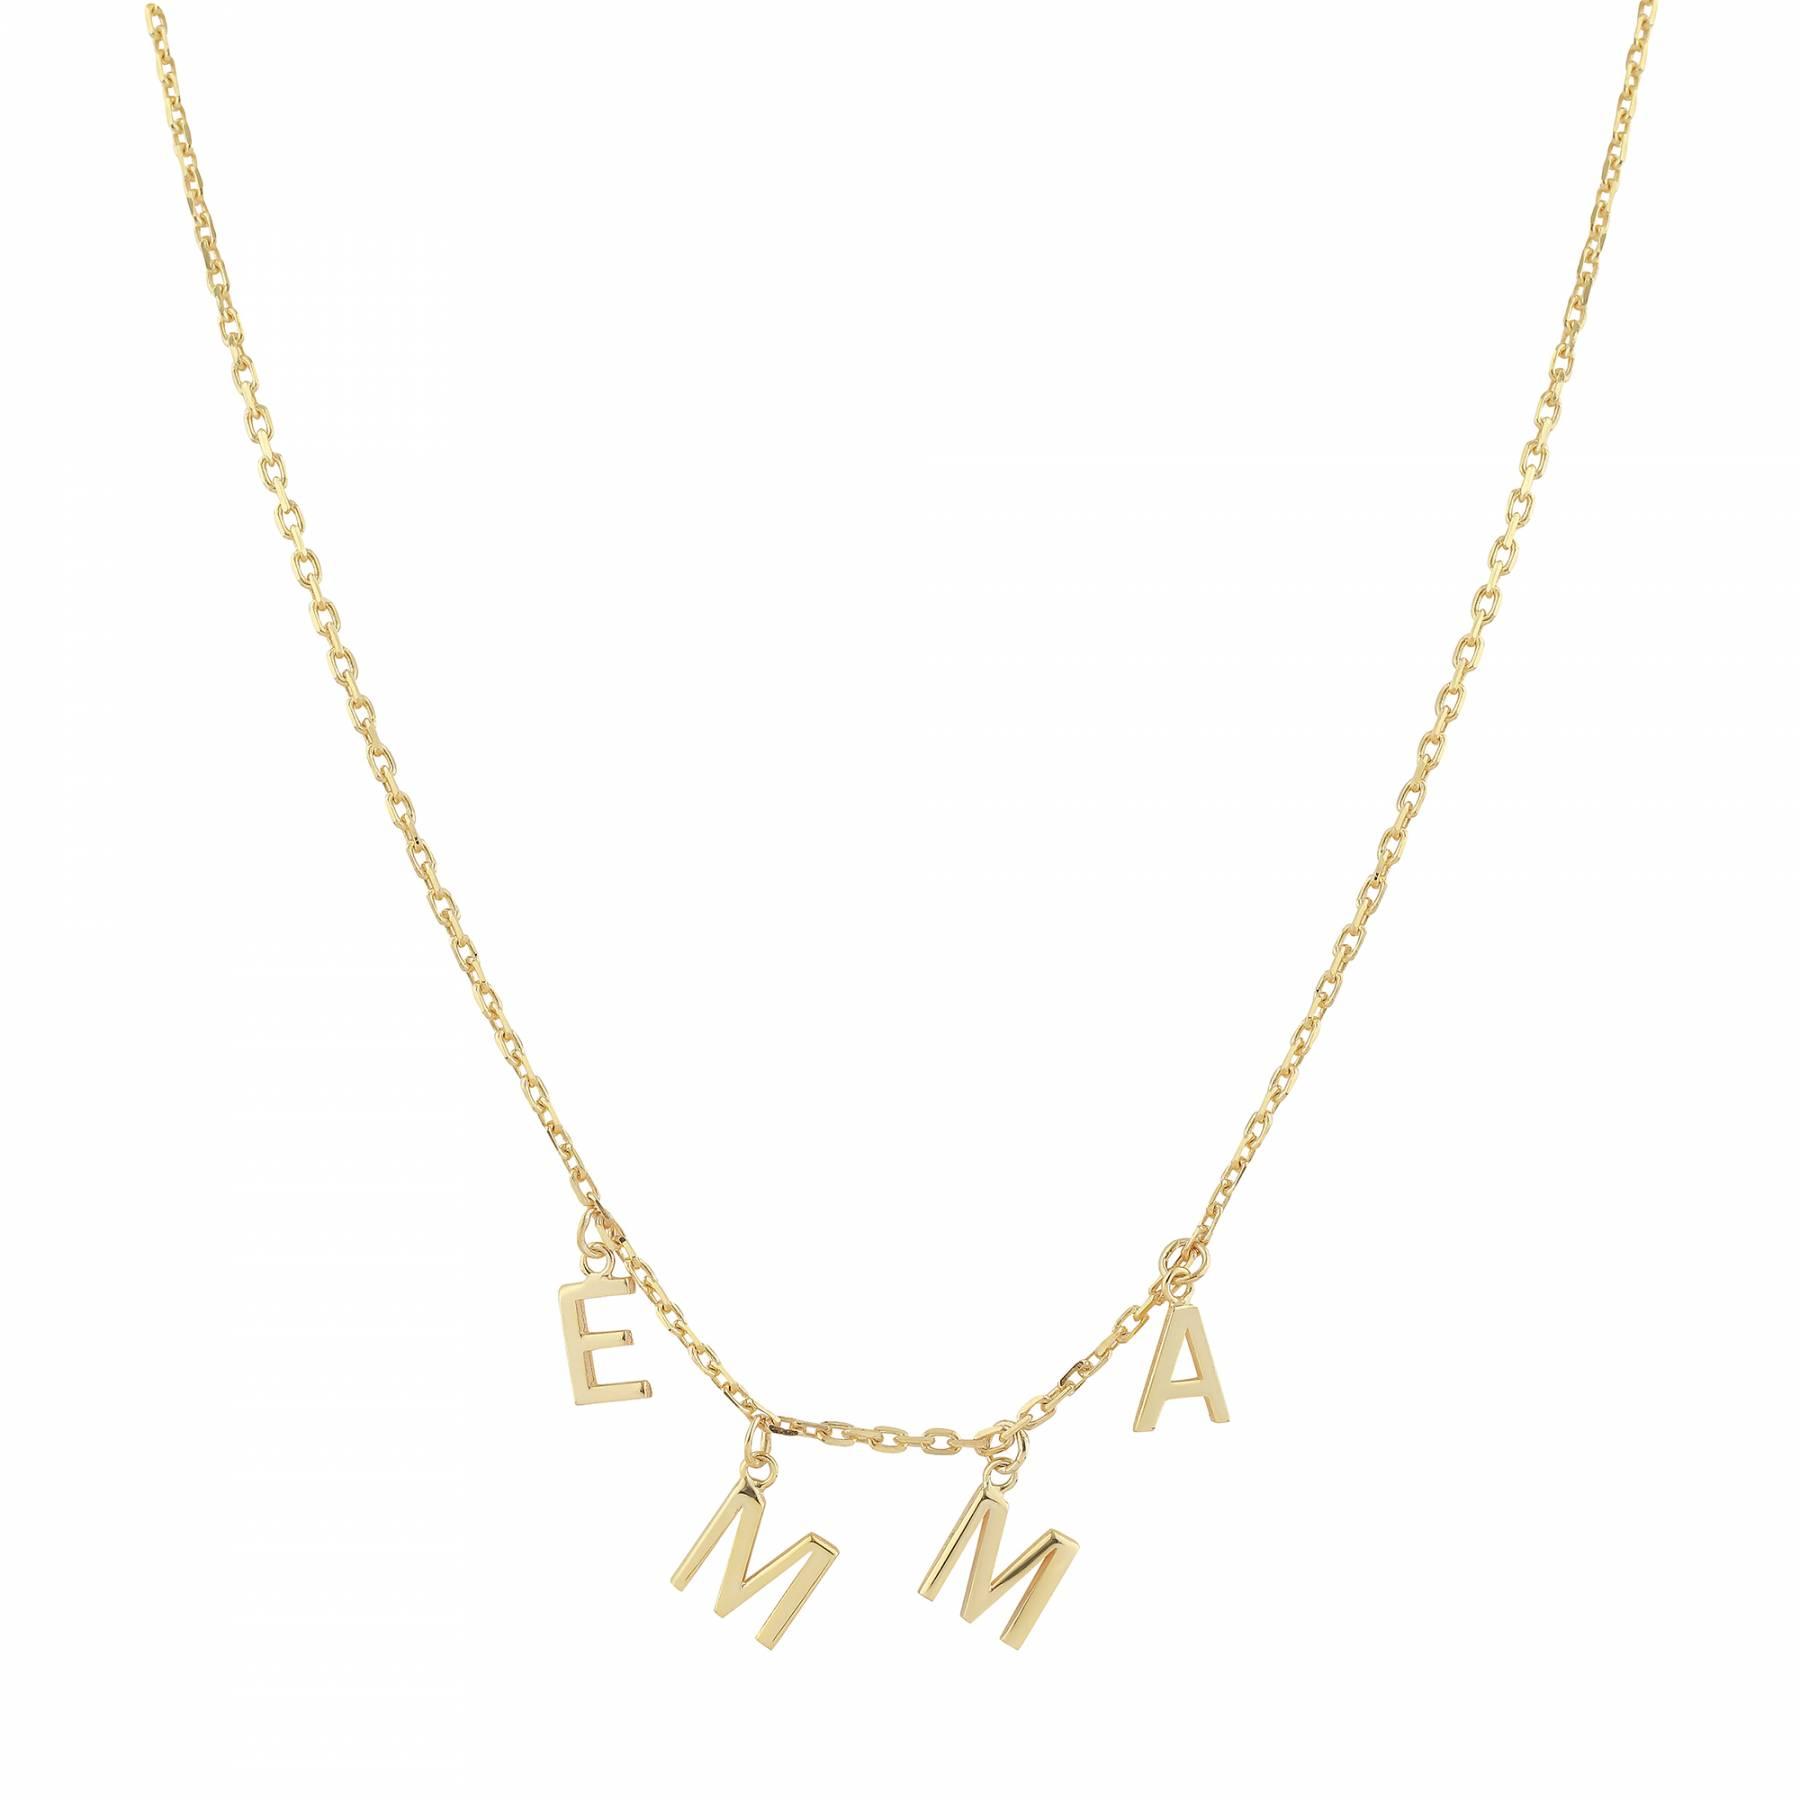 2eeb8c391d212 DANGLE LETTERS - Charm Letter Name Necklace - Dangle Charm Letters ...